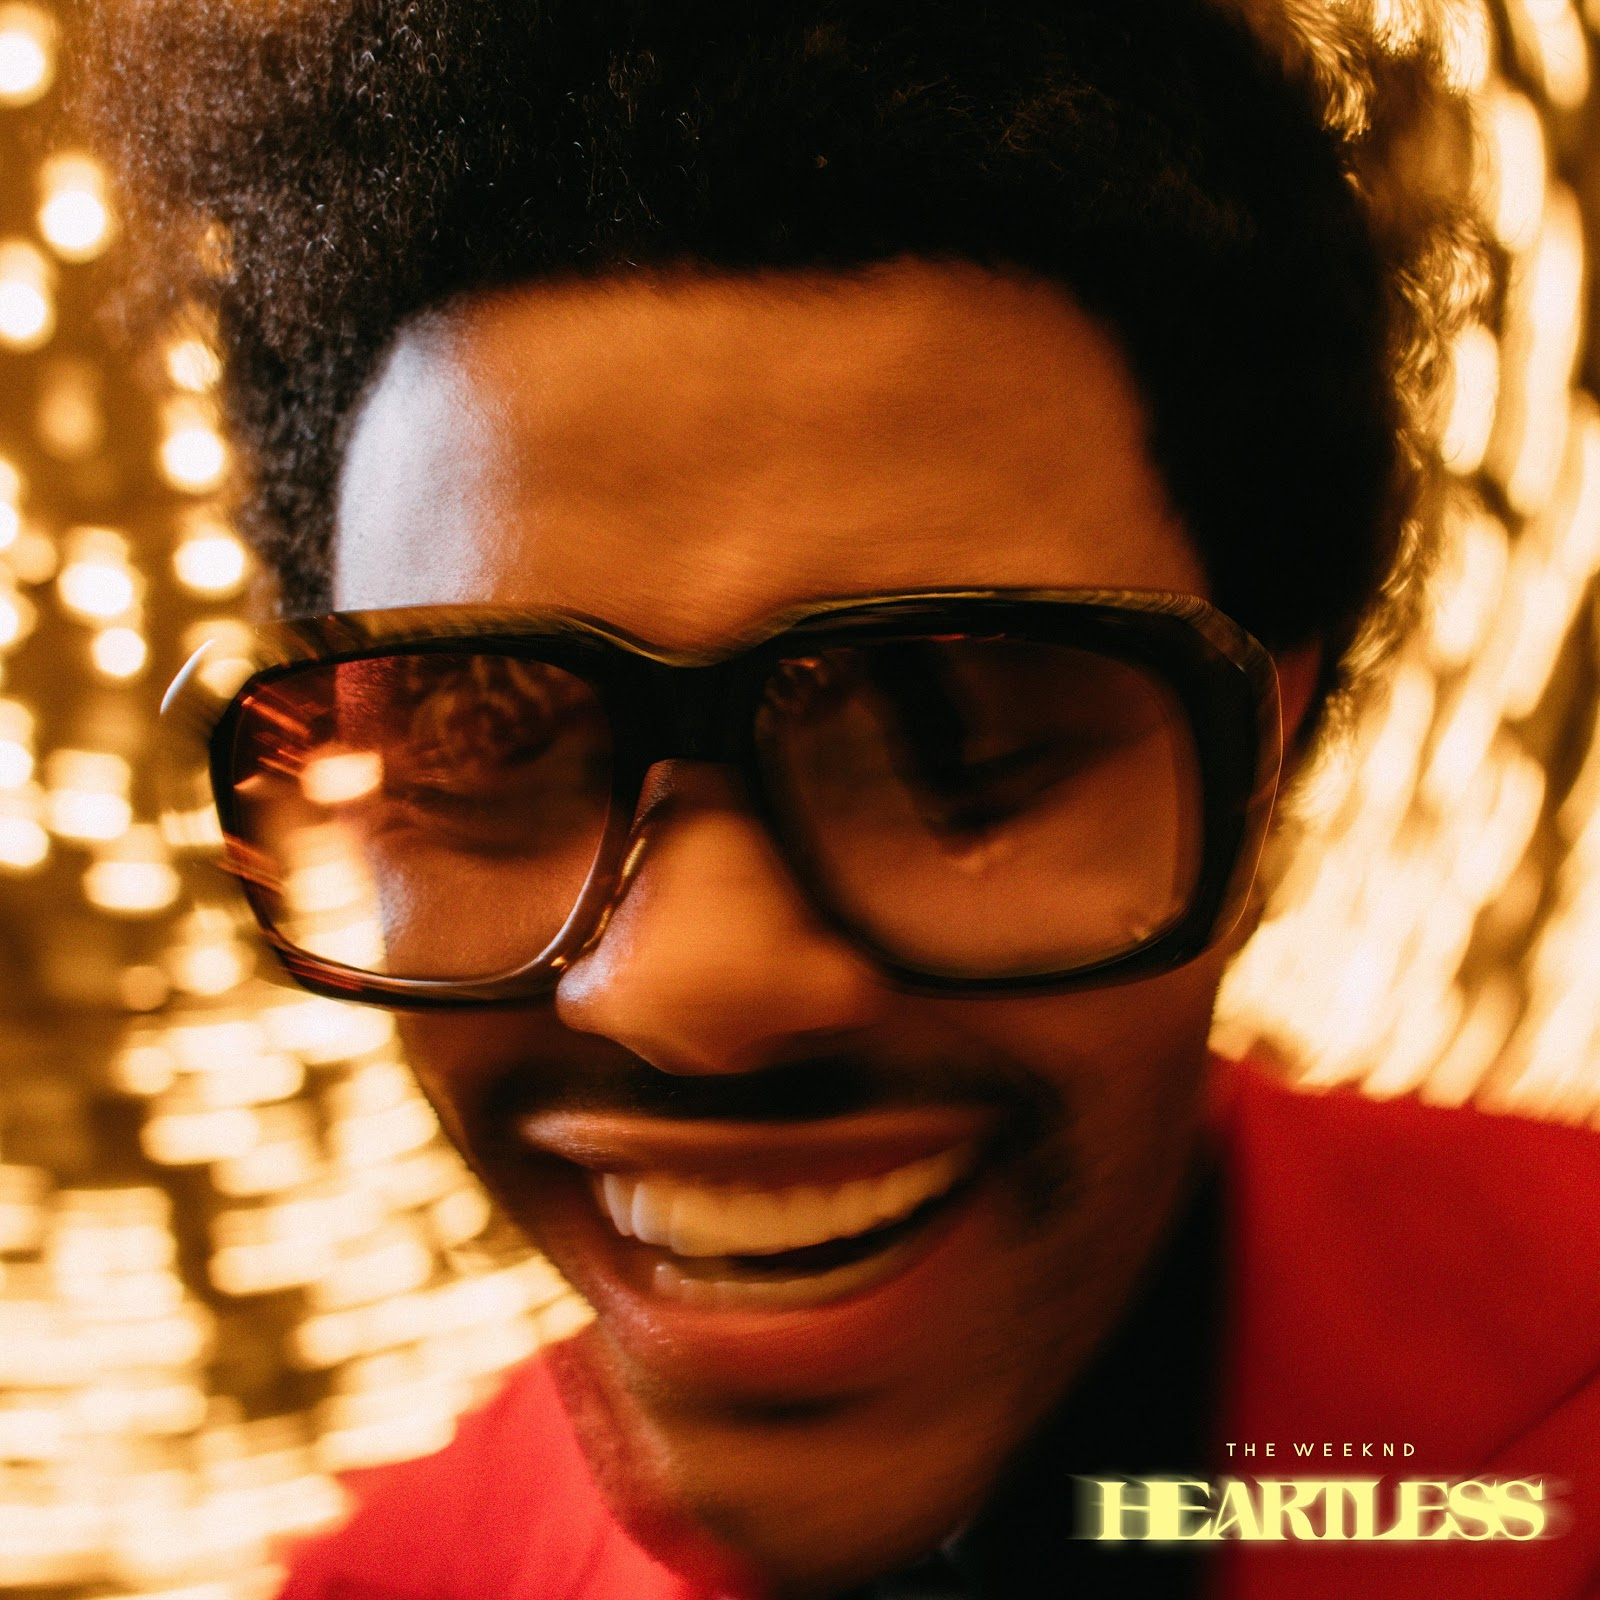 weeknd download heartless album